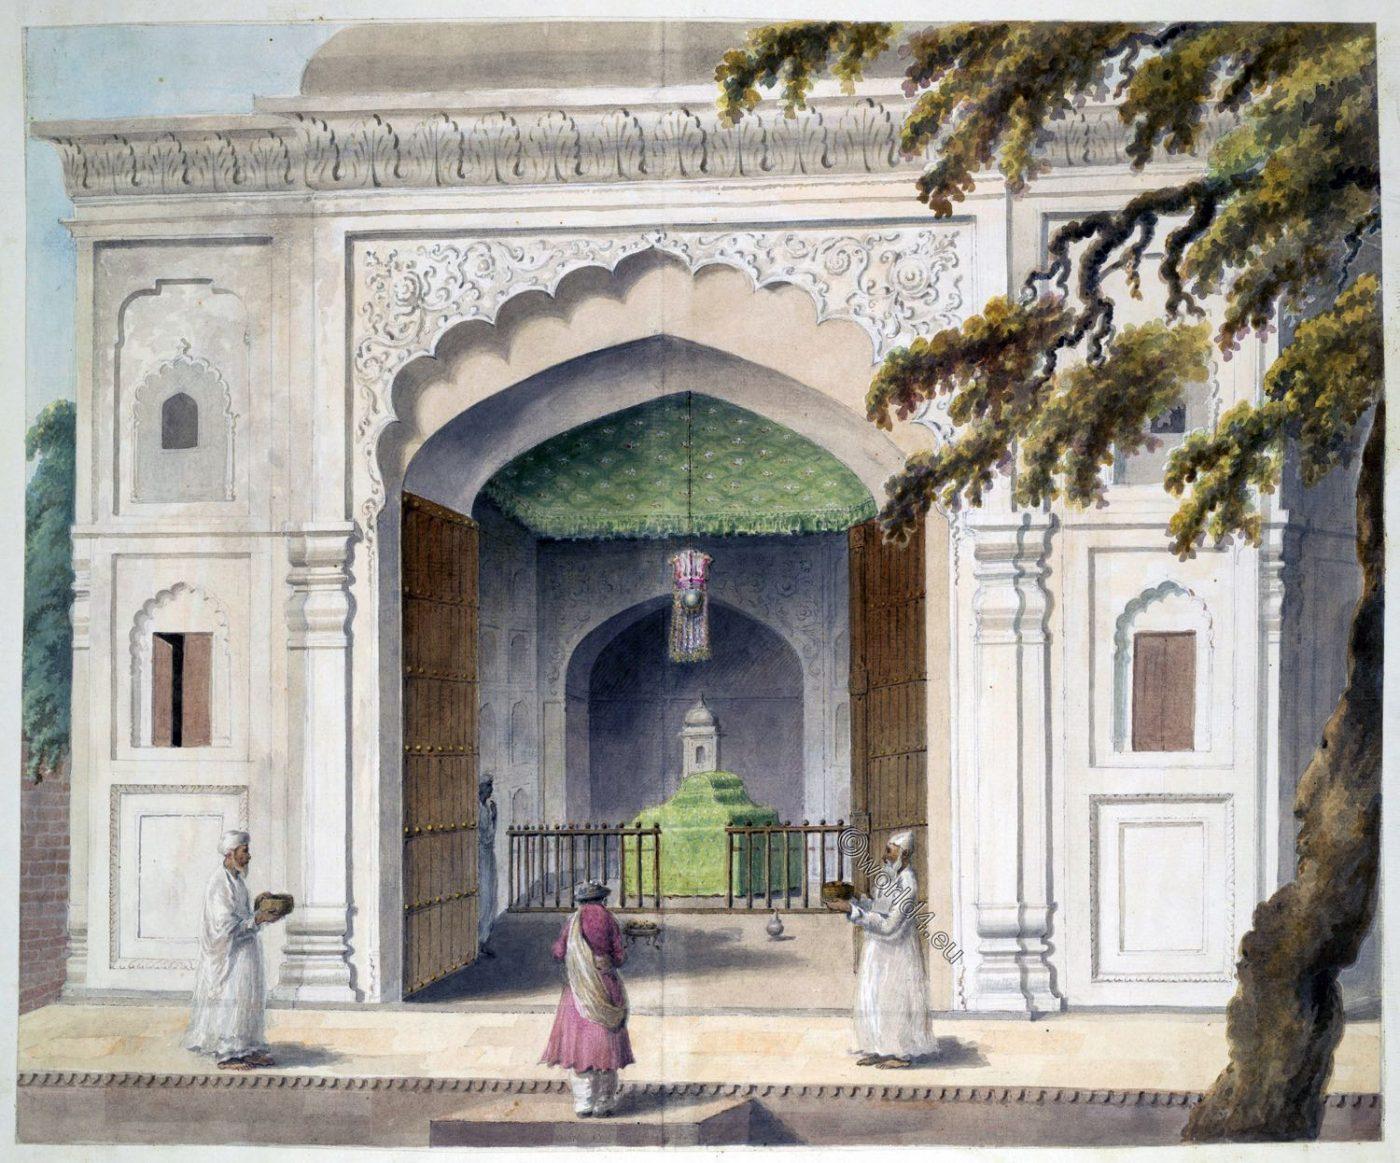 mausoleum, Hafiz Rahmat Khan, India, battle of St. George